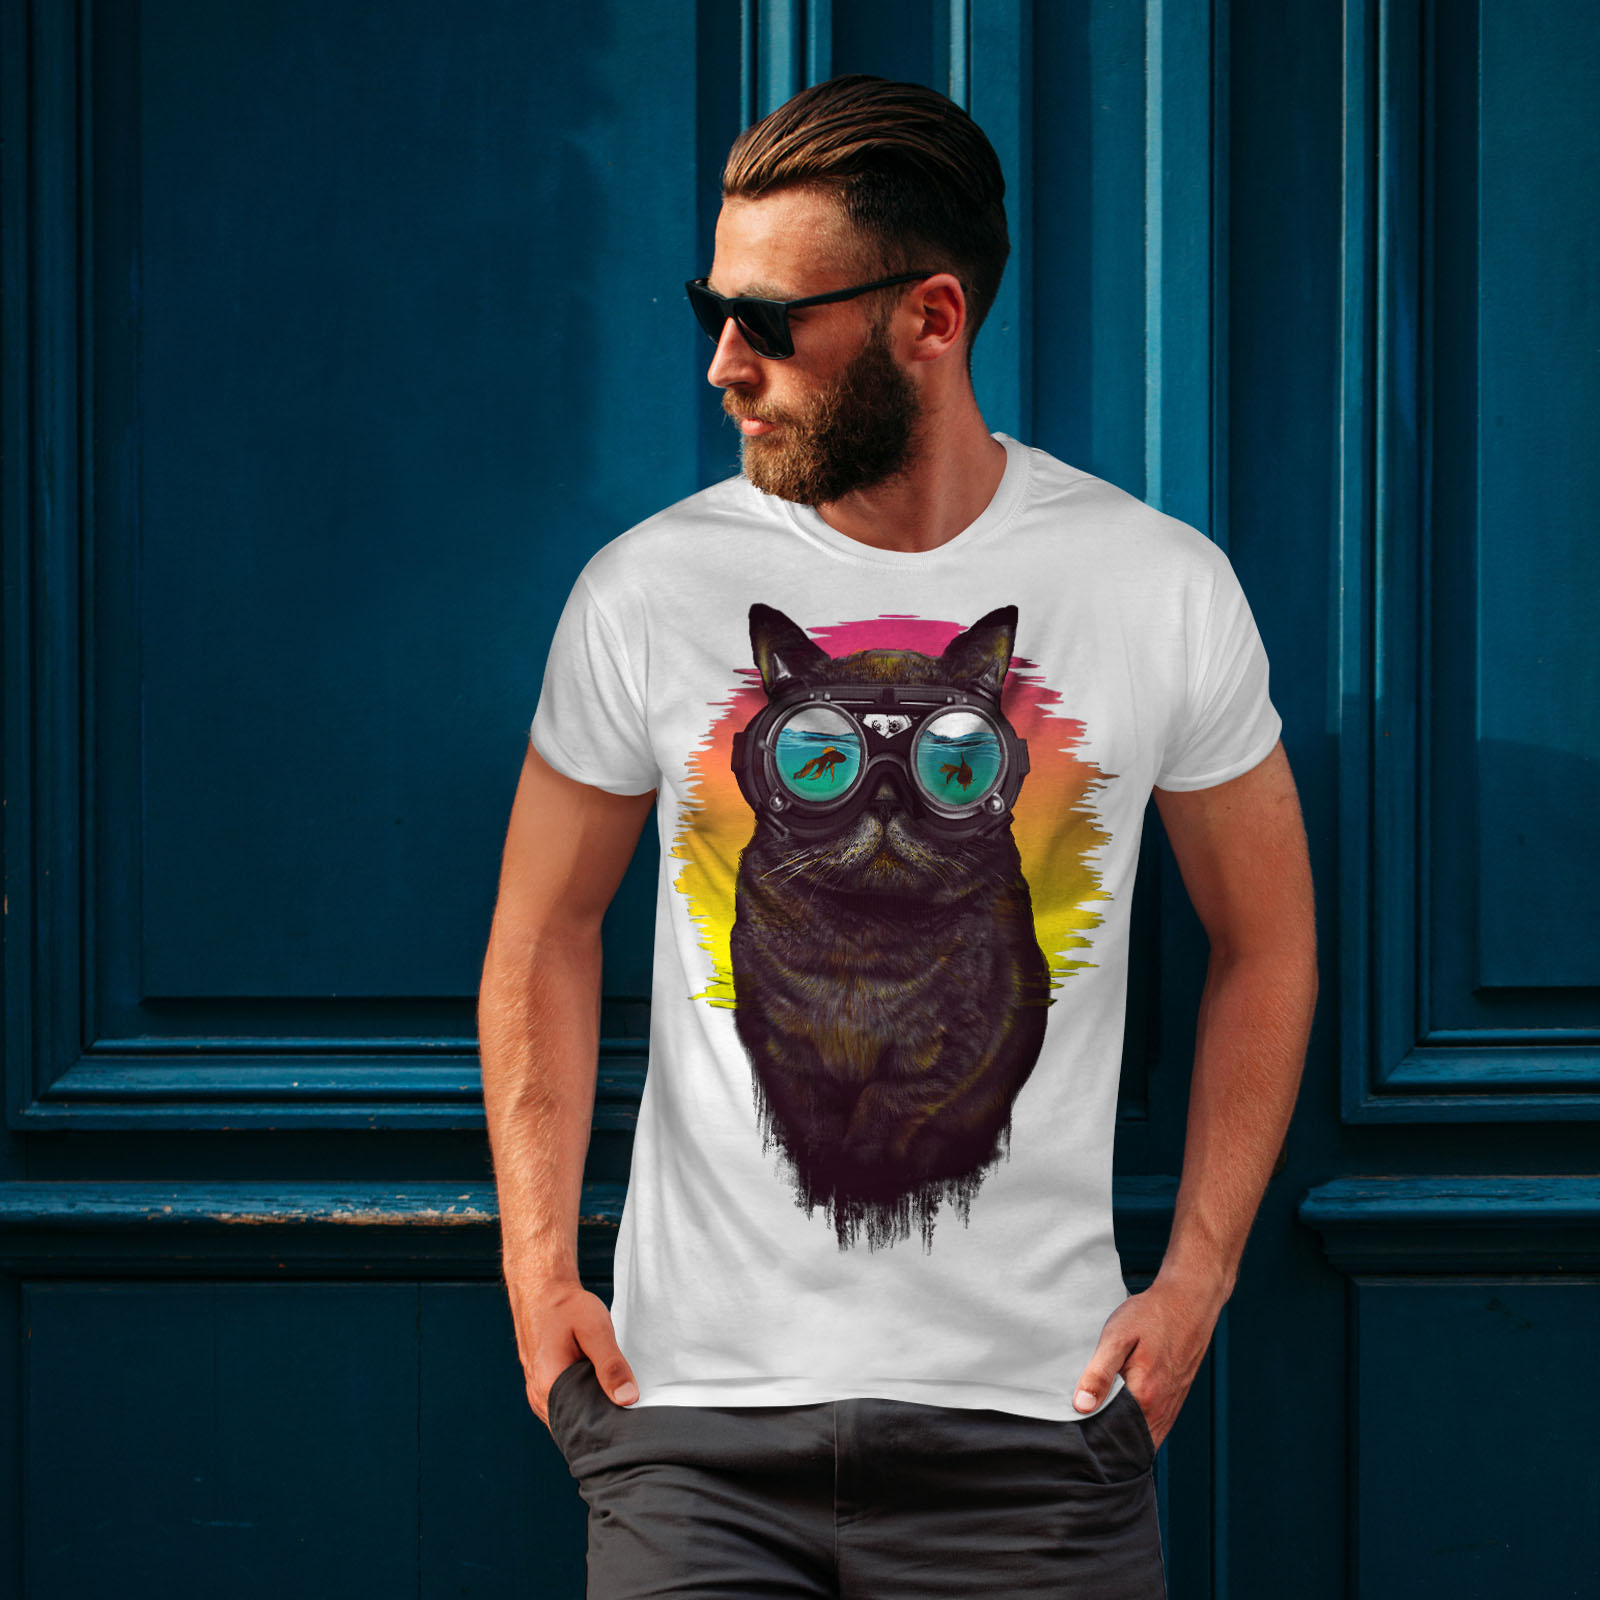 Wellcoda-Hippie-Glasses-Cool-Cat-Mens-T-shirt-Fish-Graphic-Design-Printed-Tee thumbnail 10